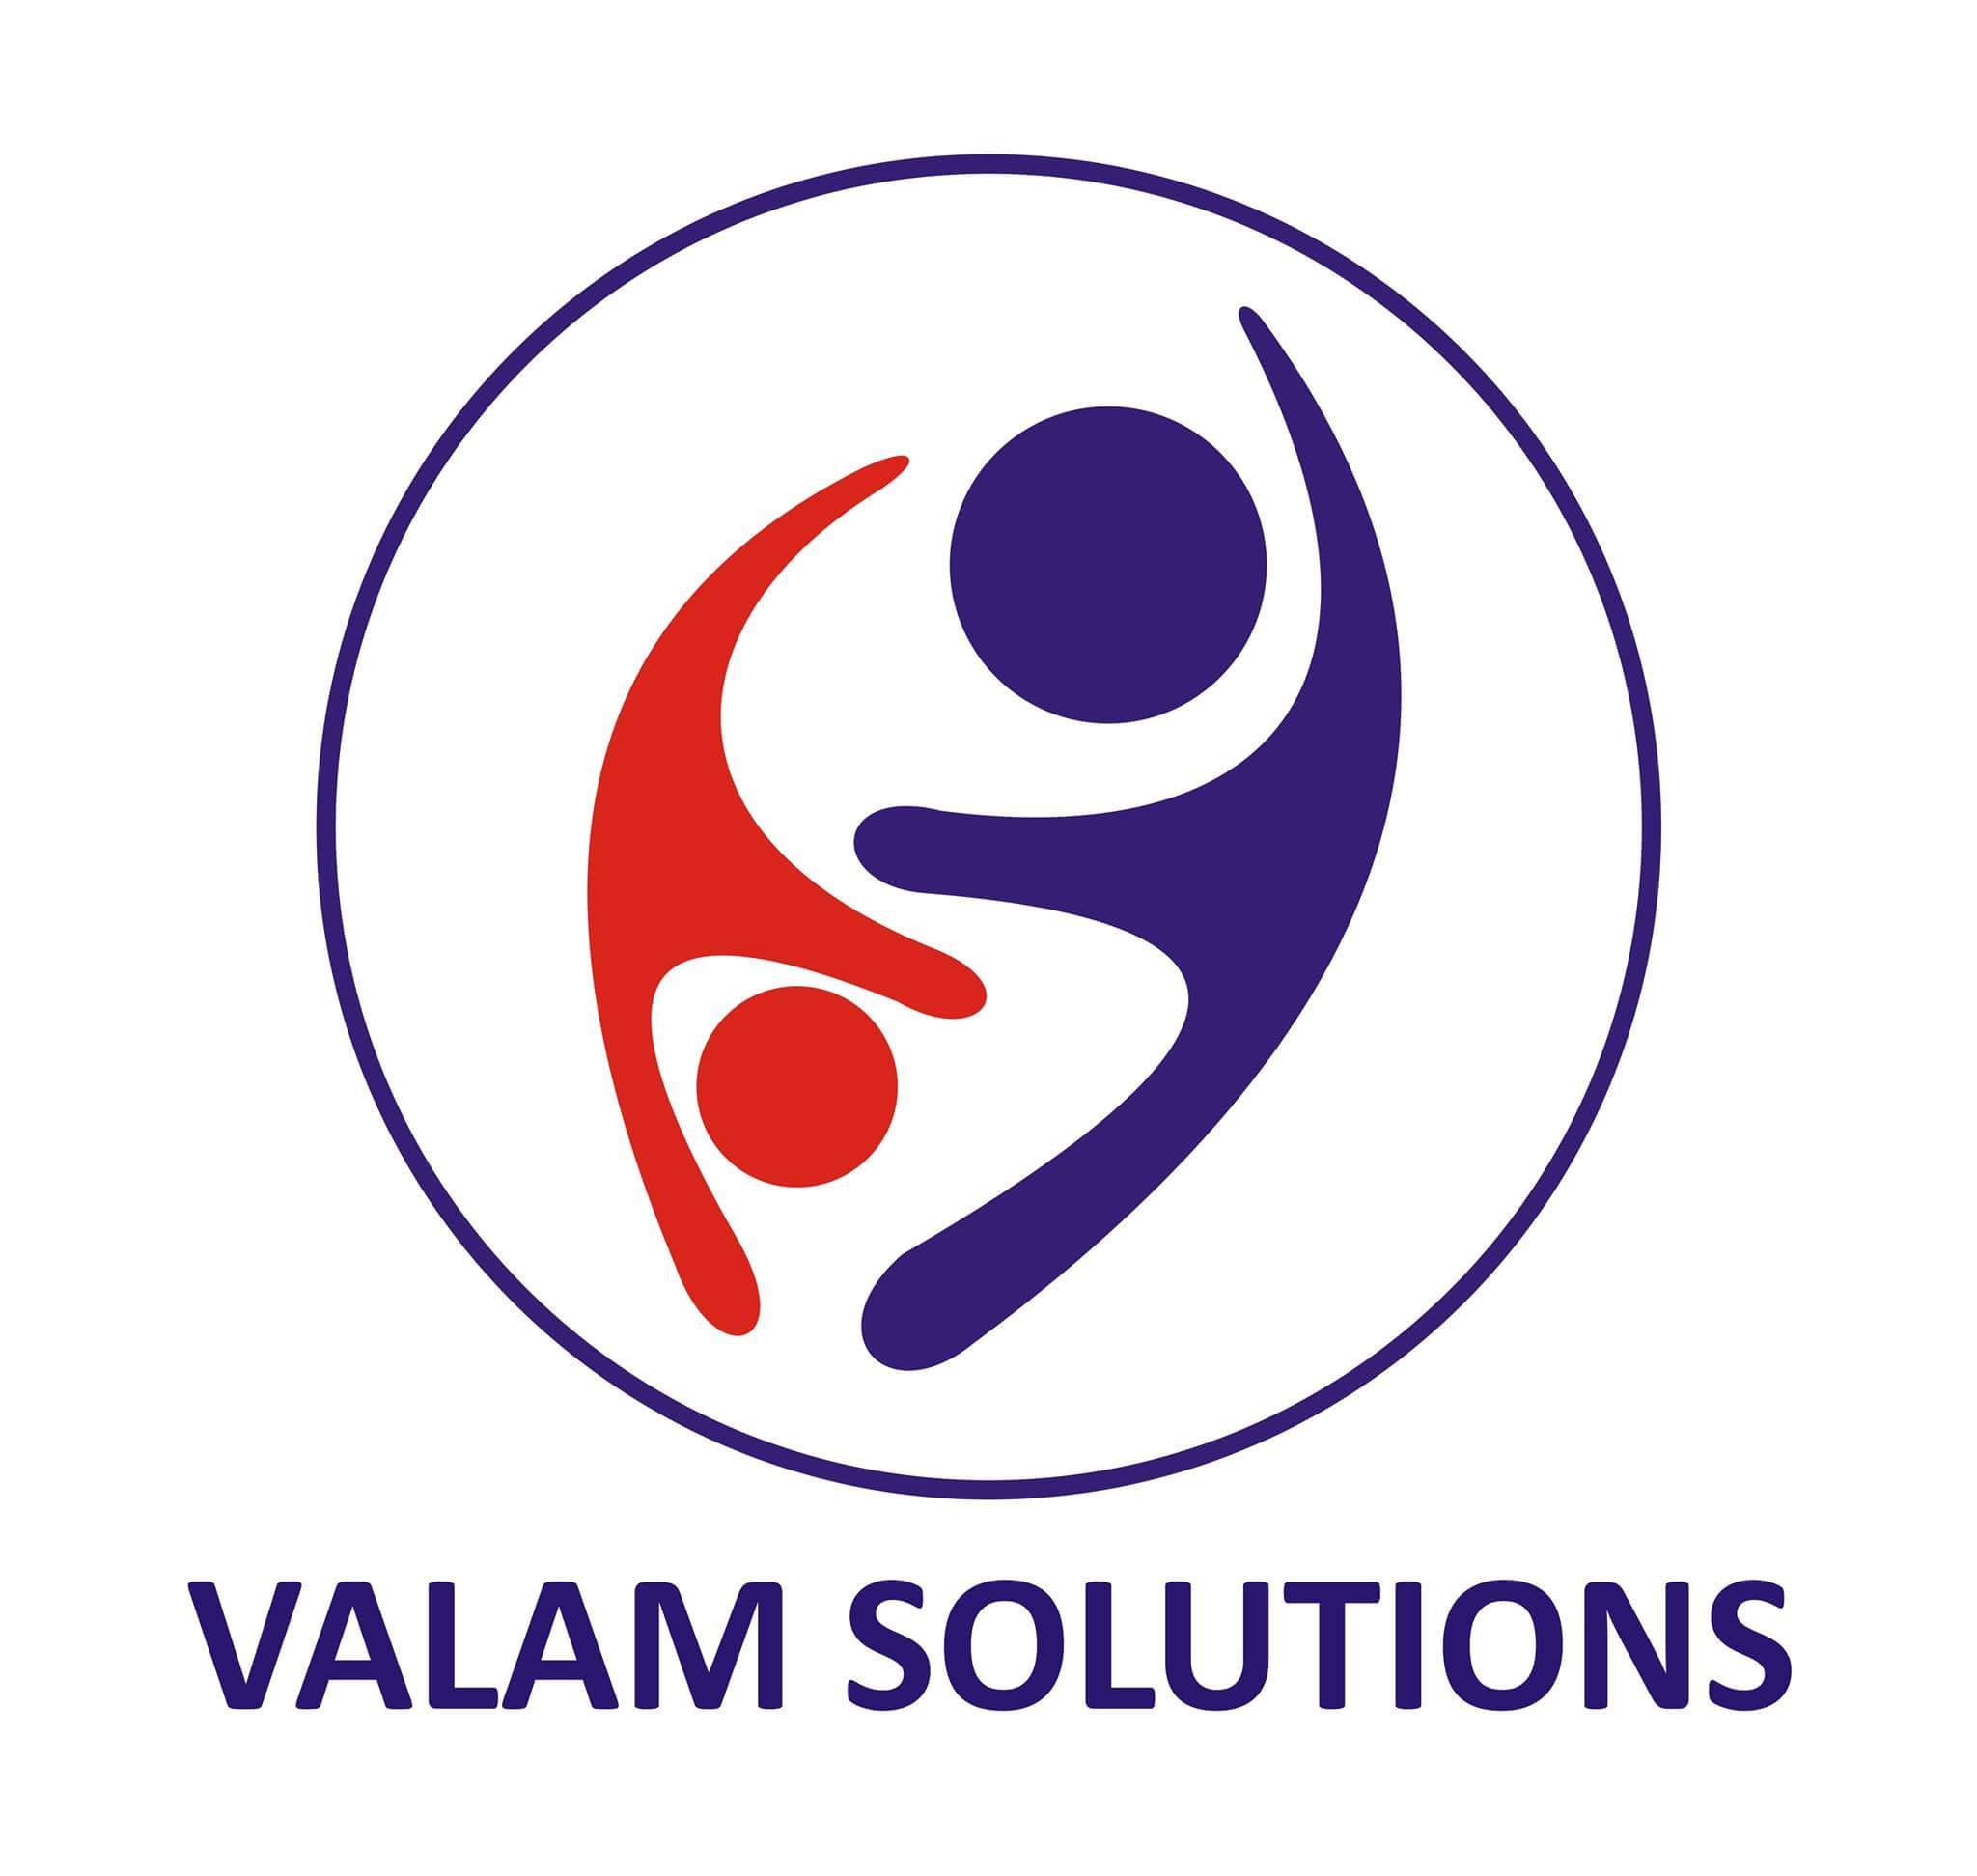 Valam Solutions Job Openings